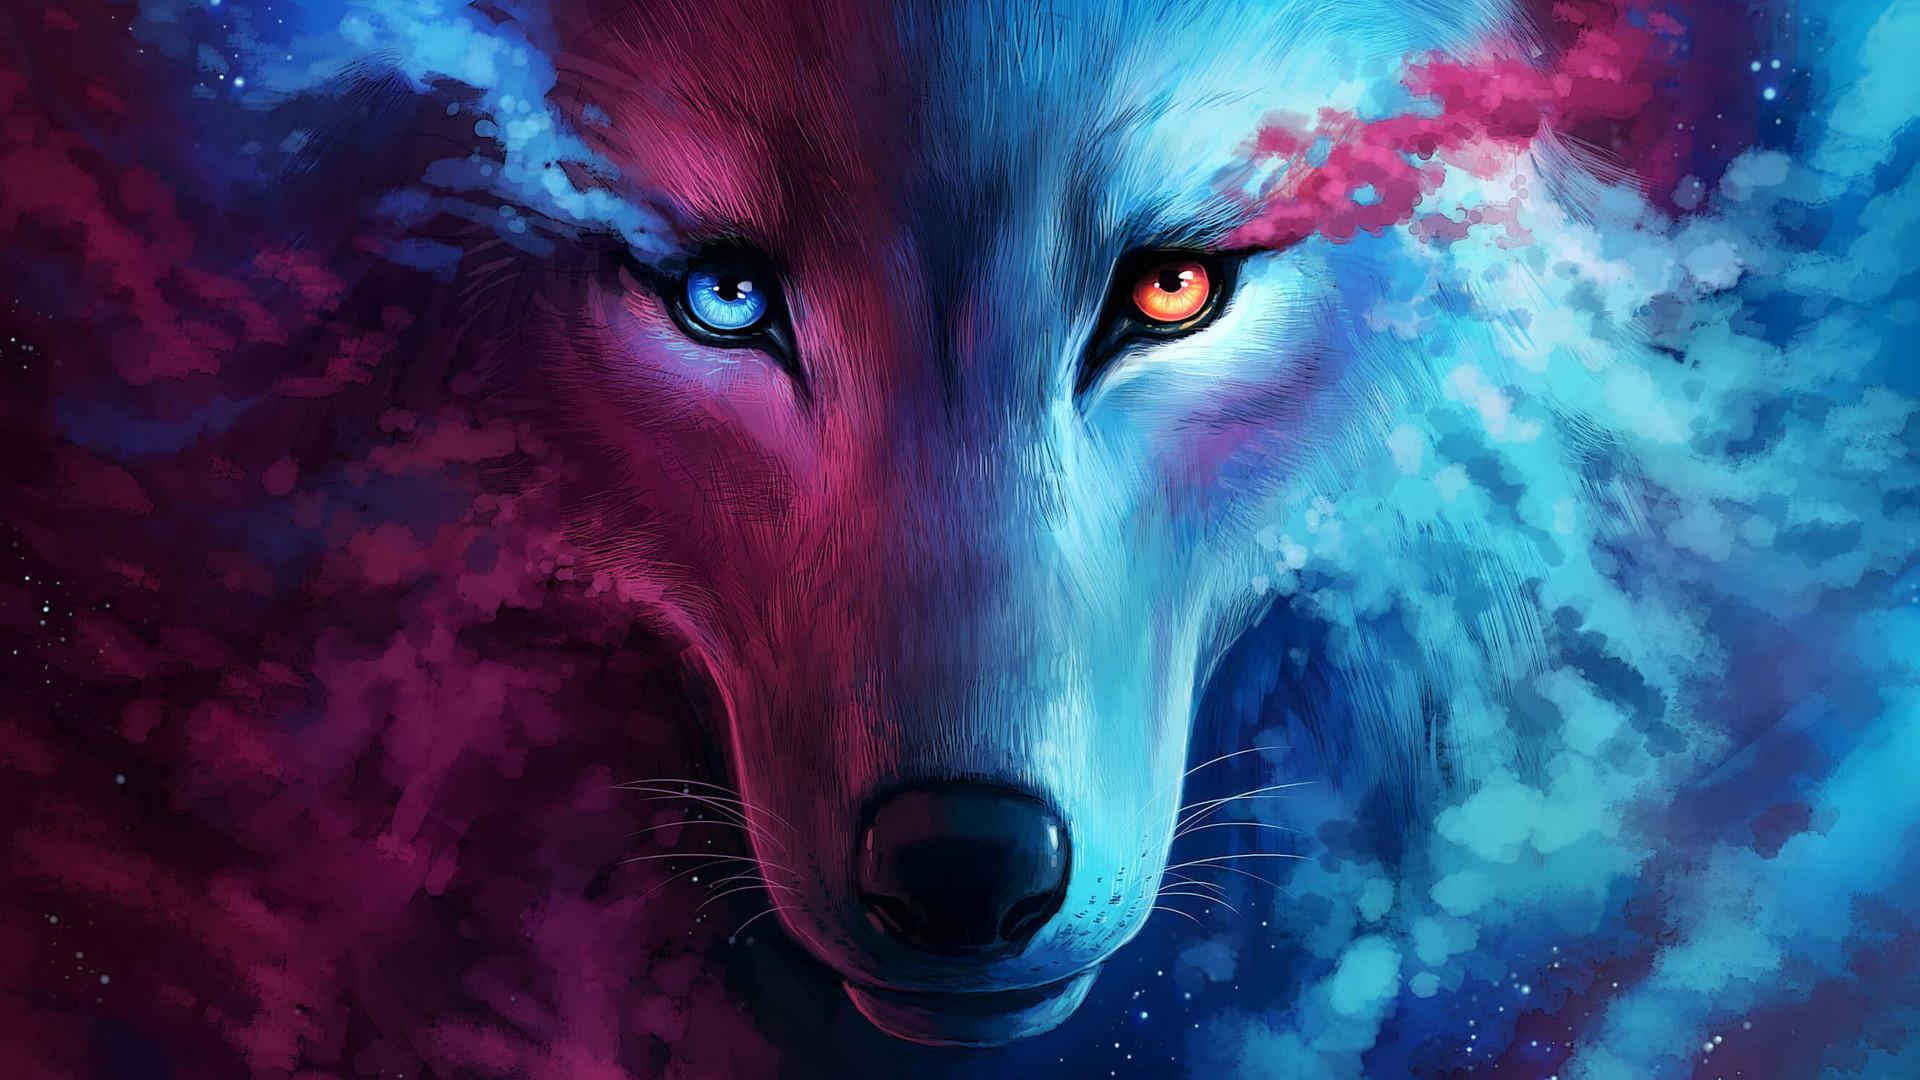 Galaxy Cool Blue Flame Galaxy Blue Wolf Wallpaper Novocom Top